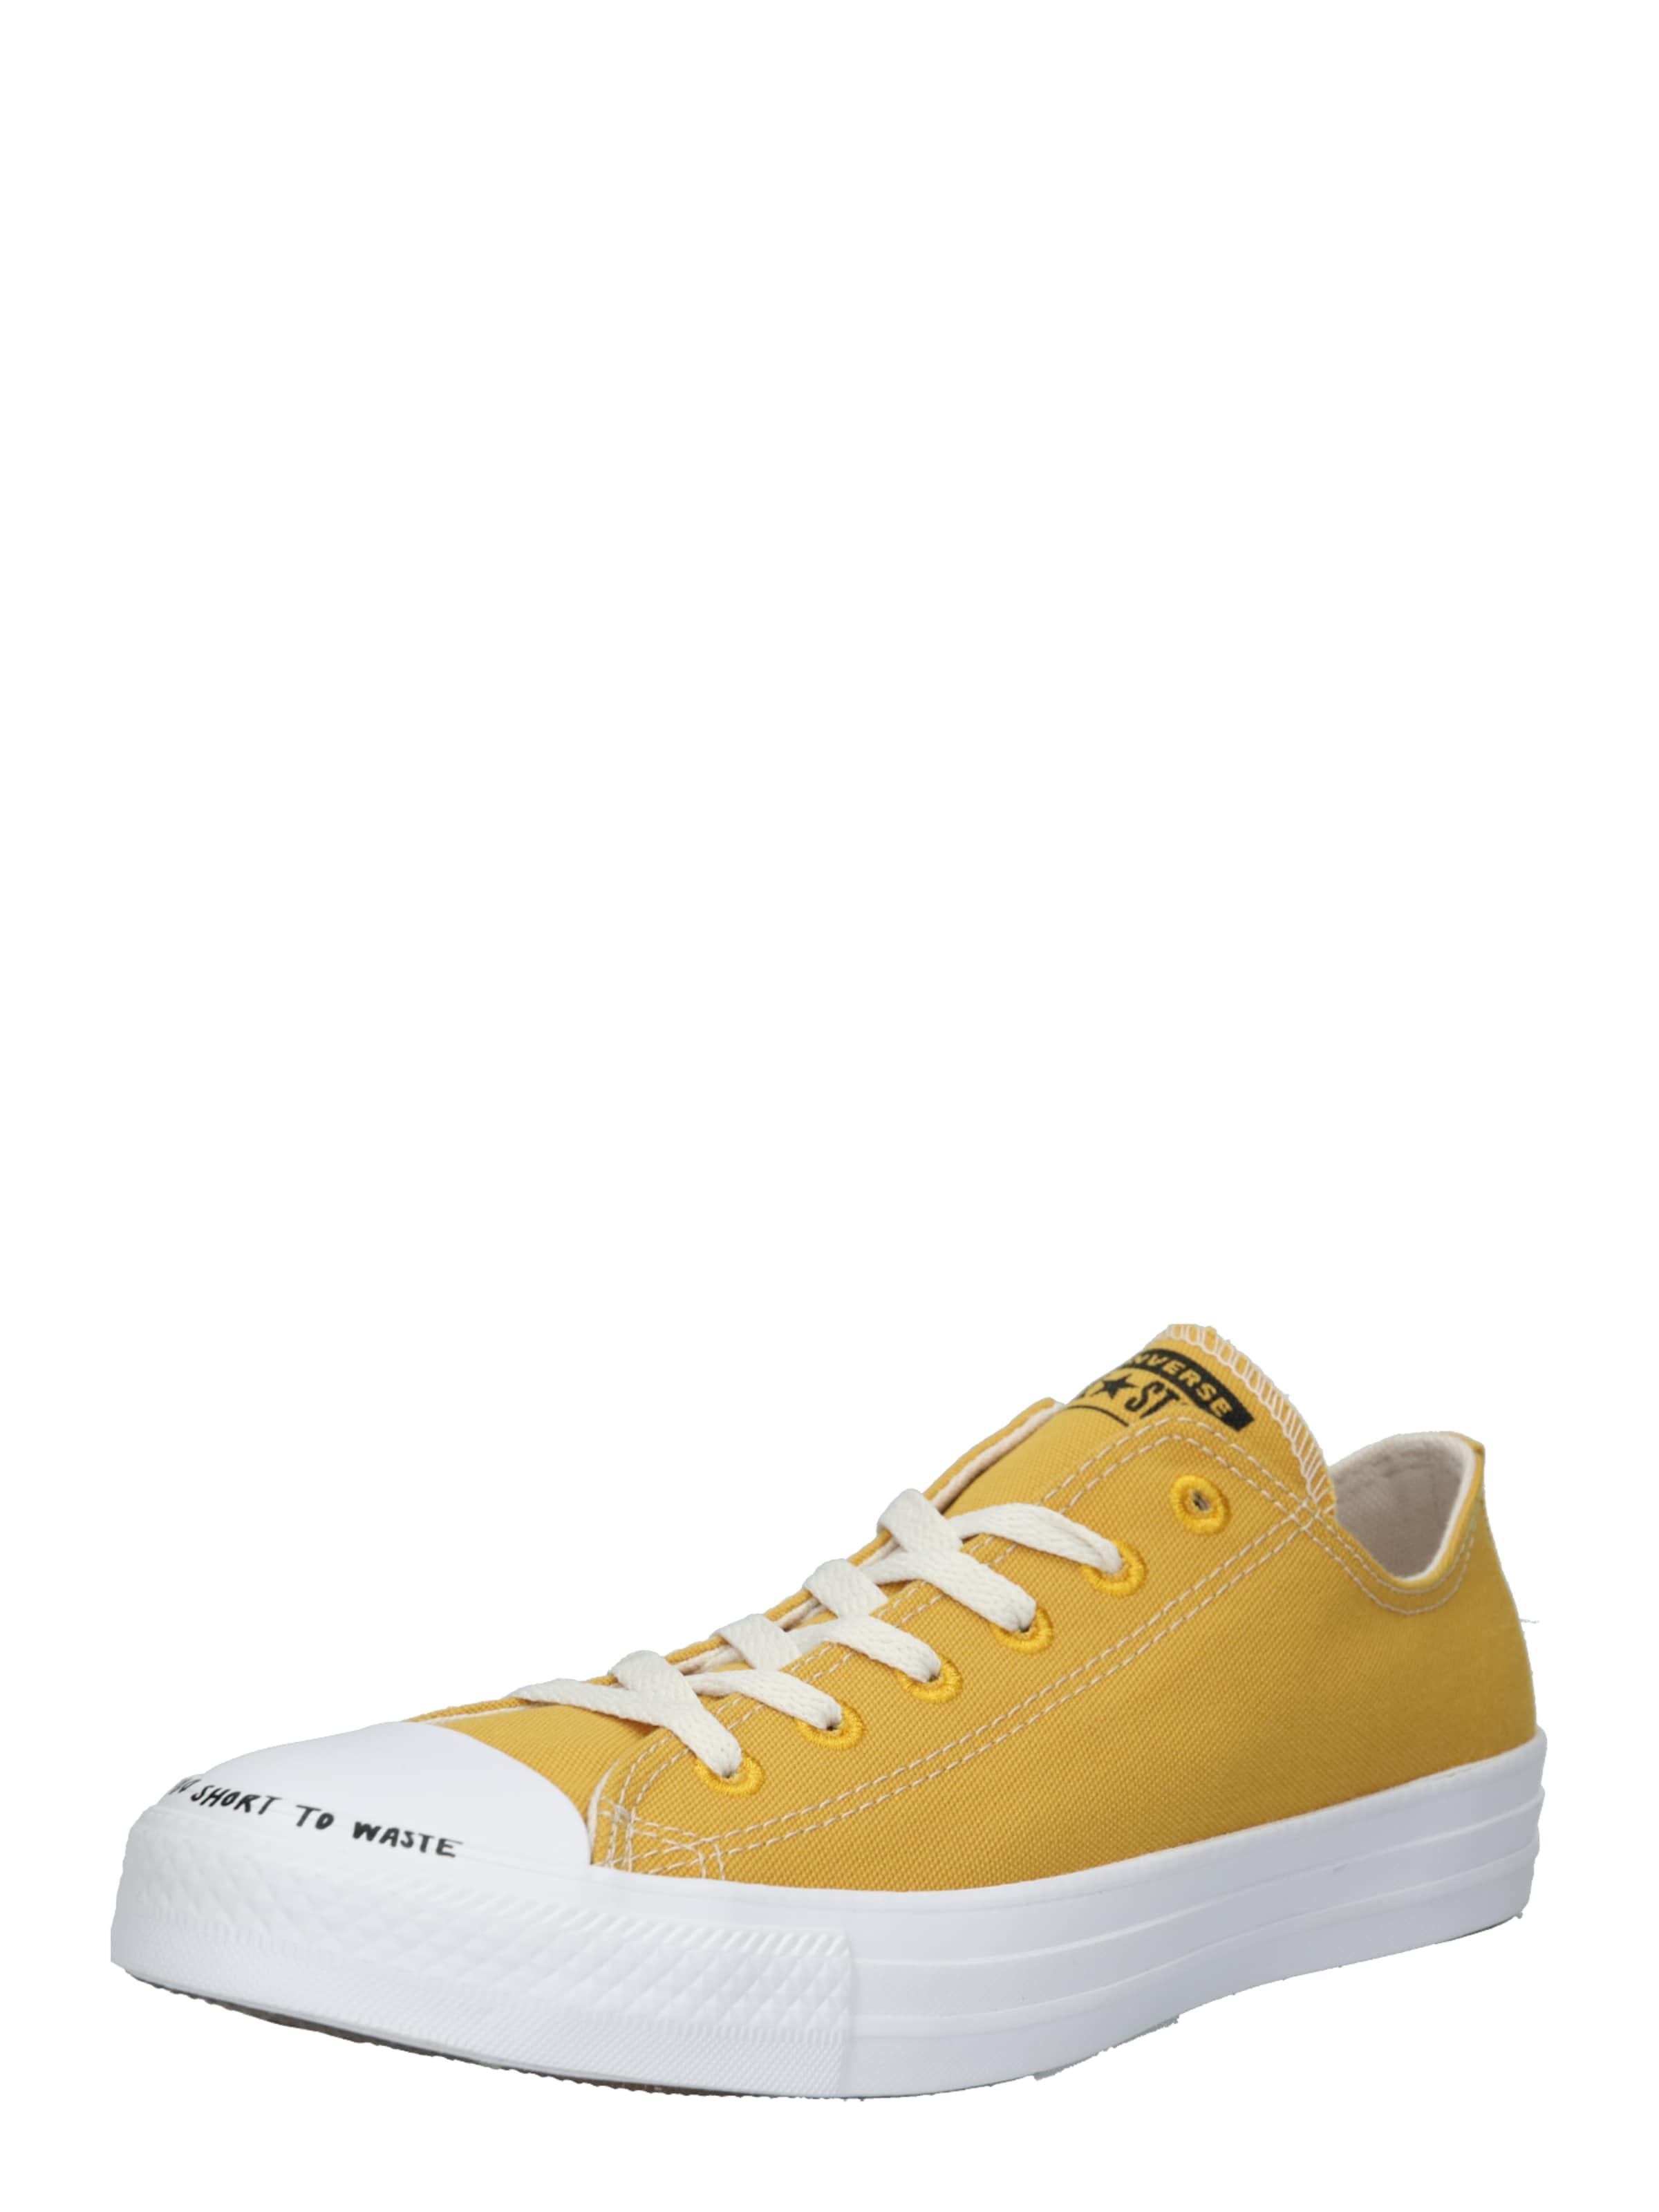 All RenewOx' Sneaker Star Taylor Converse In 'chuck Grün FlcK1uTJ3